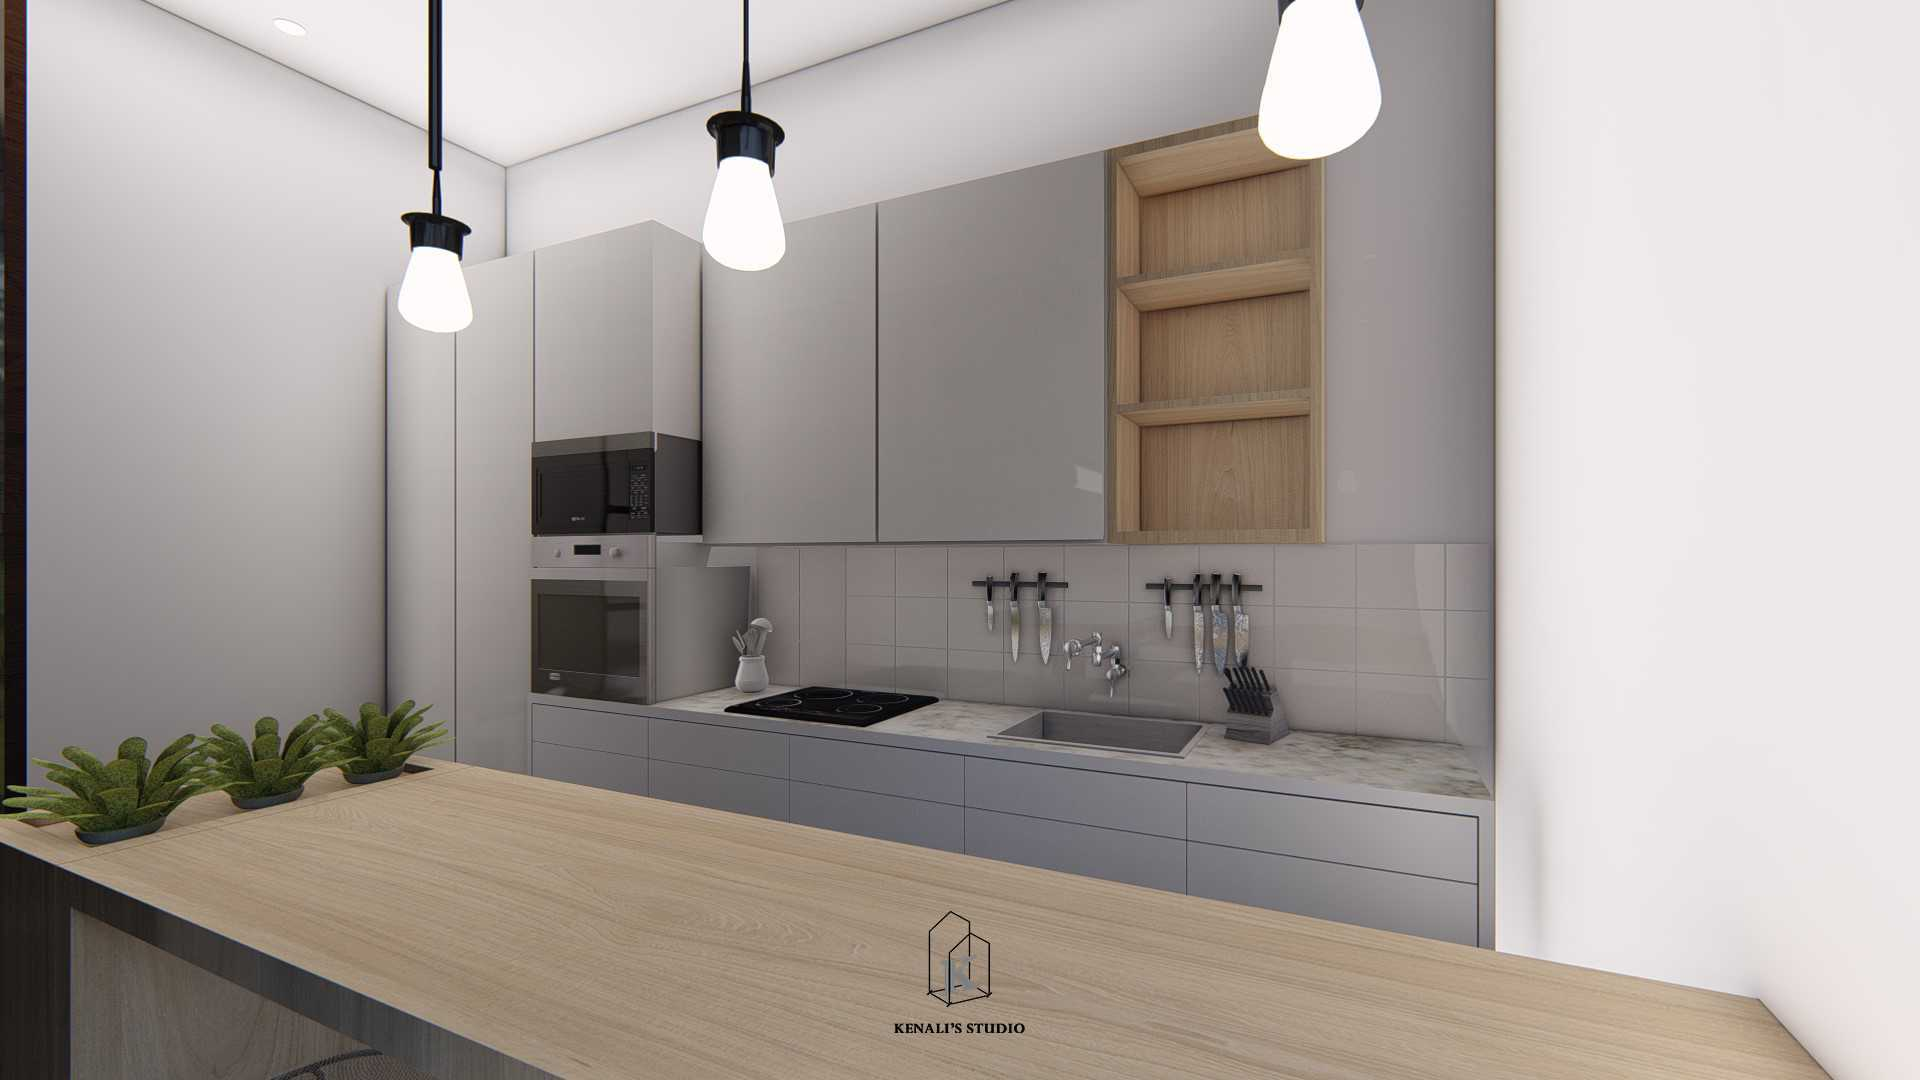 Kenali's Studio D - Living & Kitchen Surabaya, Kota Sby, Jawa Timur, Indonesia Surabaya, Kota Sby, Jawa Timur, Indonesia Kenalis-Studio-D-Living-Kitchen  93620